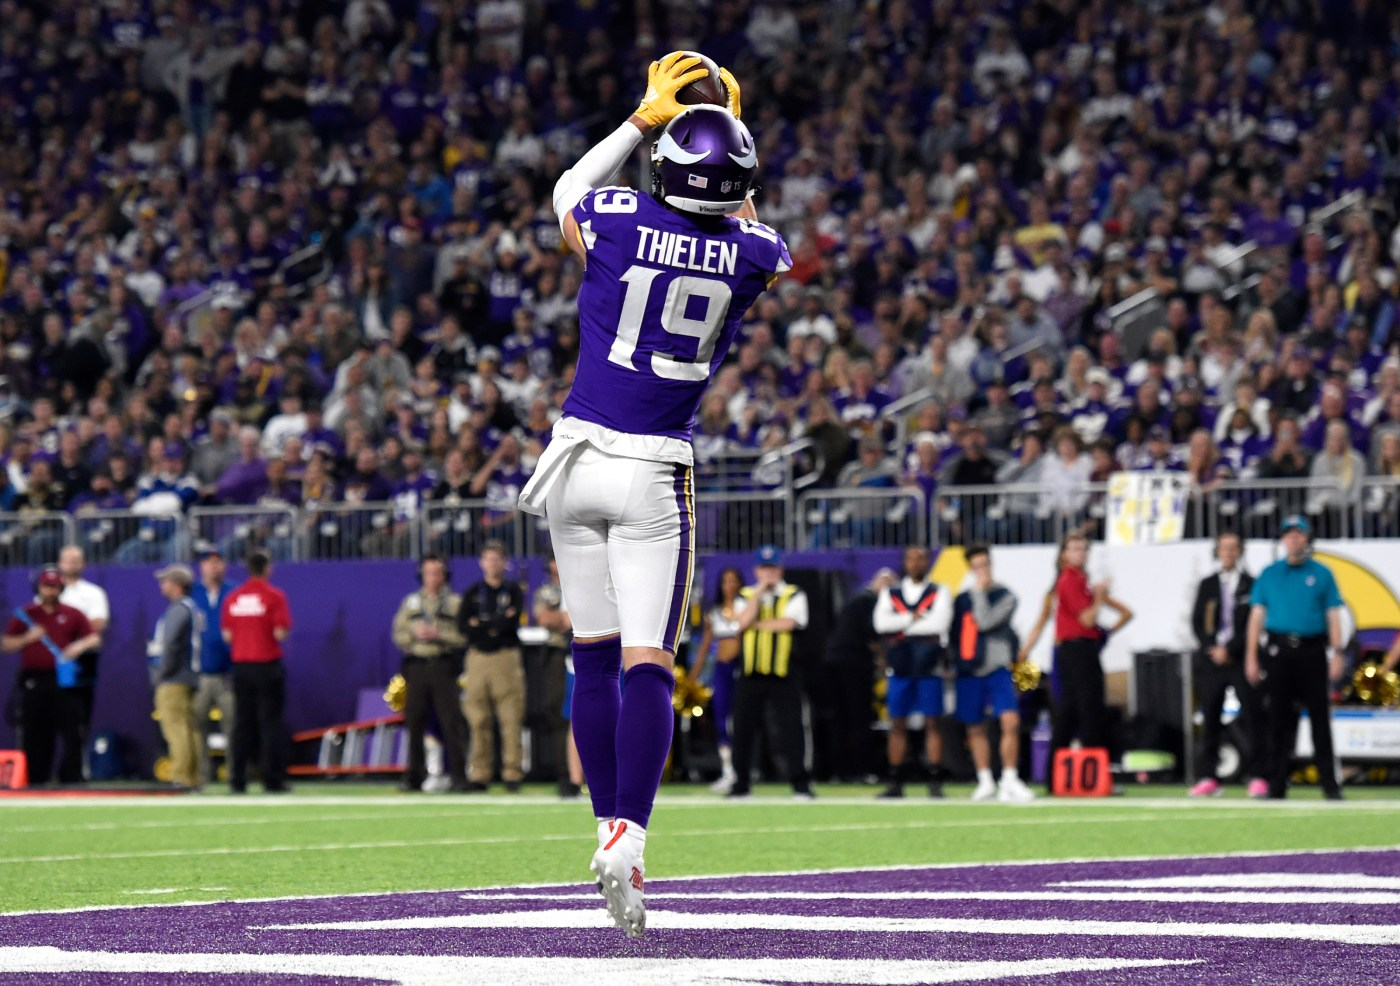 Minnesota Vikings: Adam Thielen is most underpaid receiver in NFL